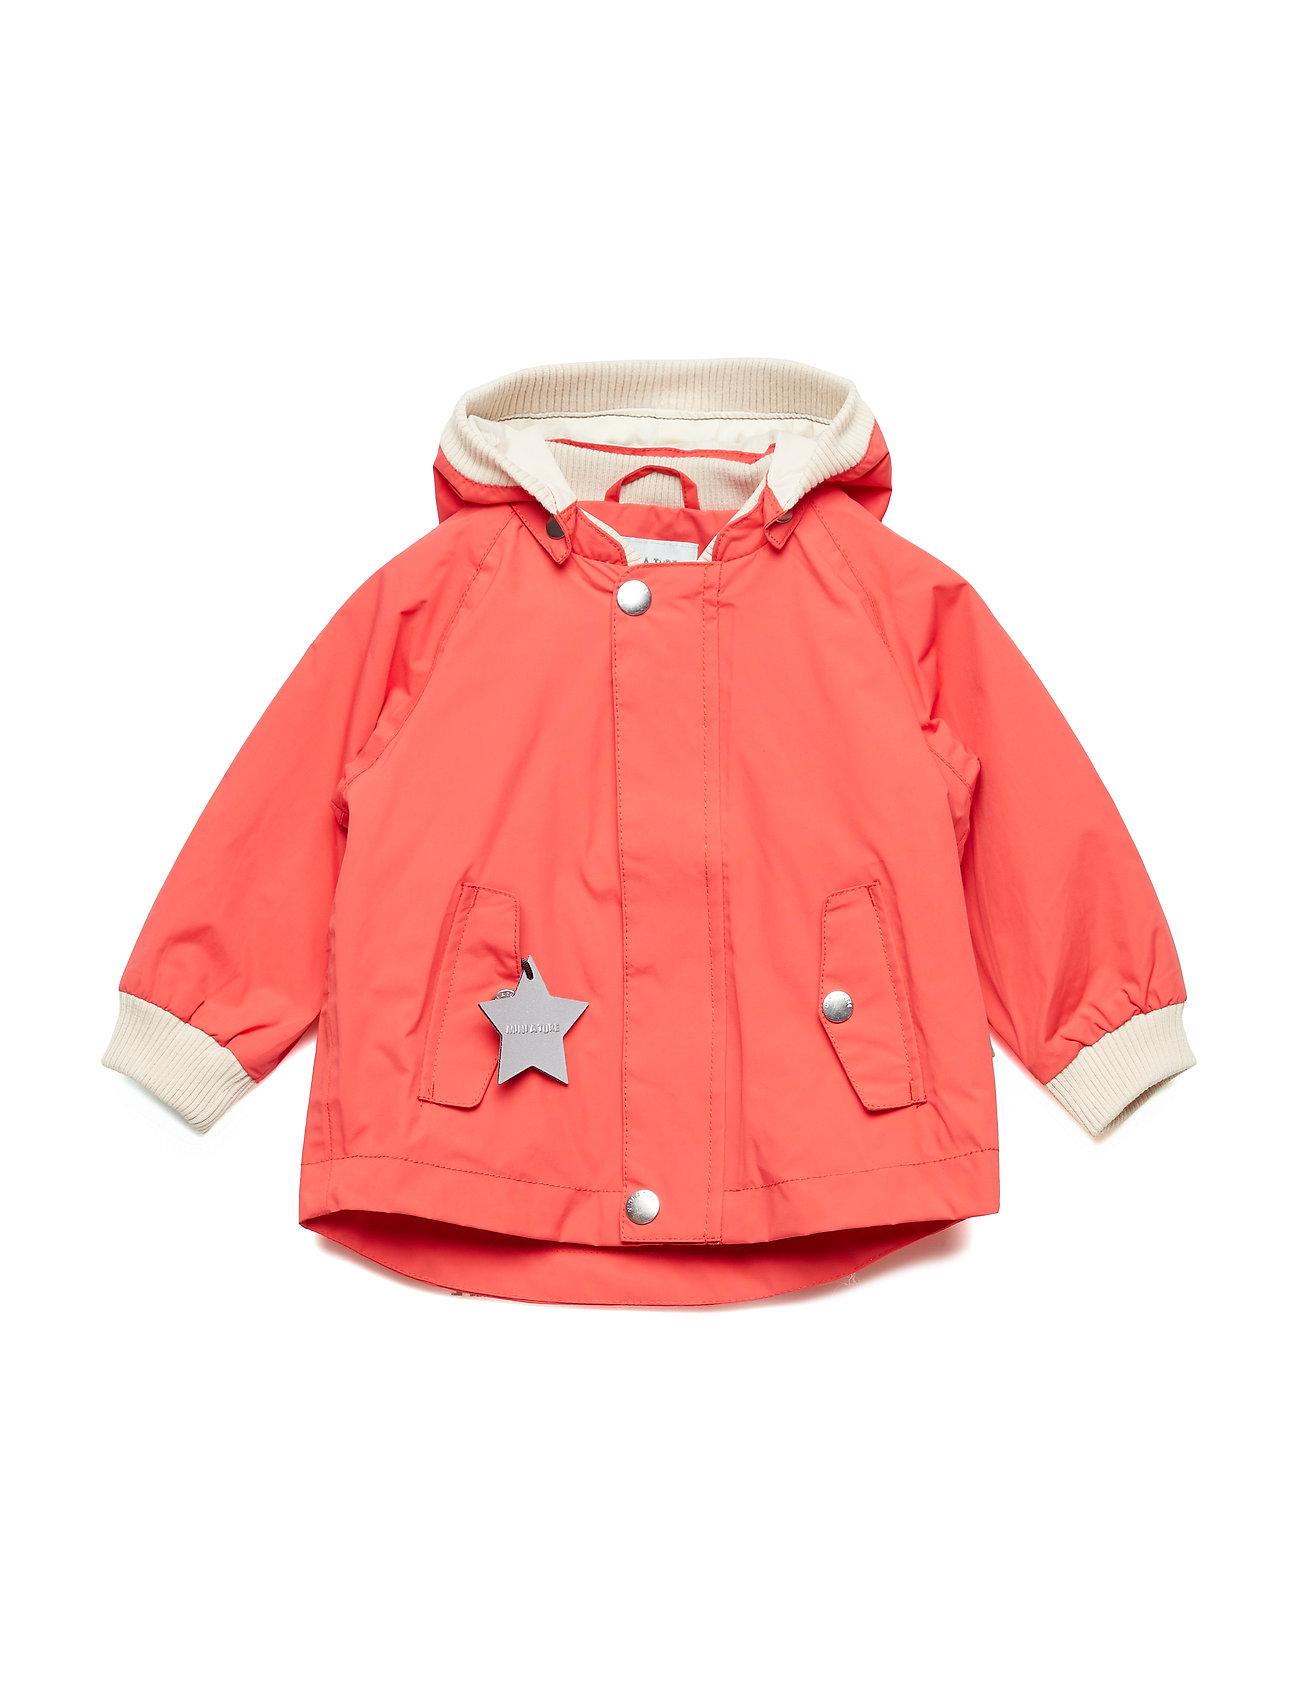 Mini A Ture Wally Jacket, M